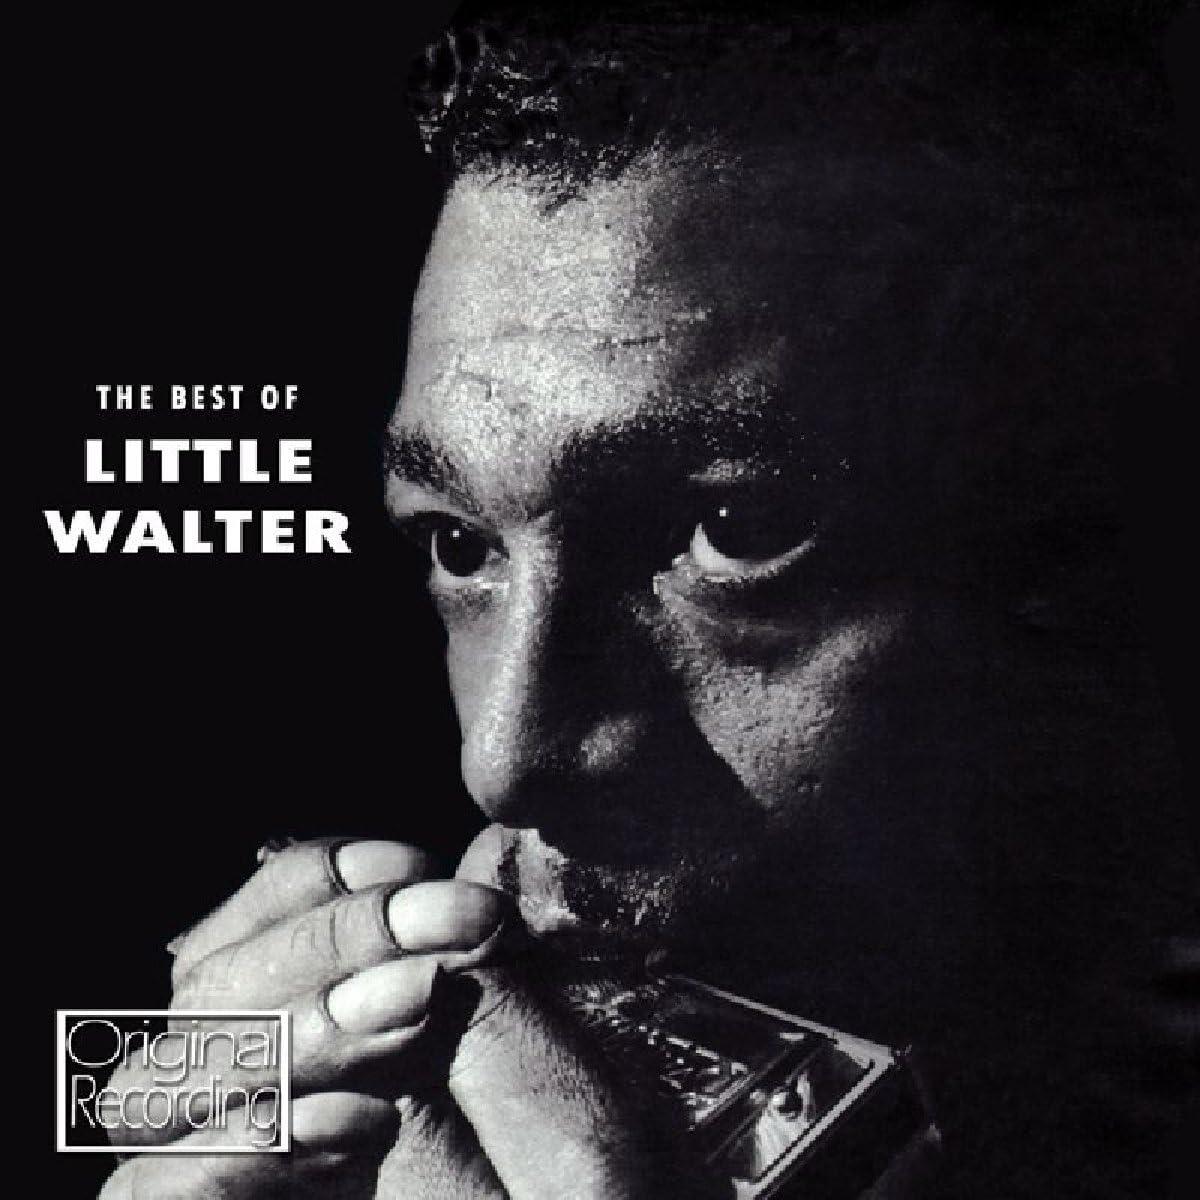 Amazon | Best of Little Walter | Little Walter | シカゴ・シティブルース | 音楽